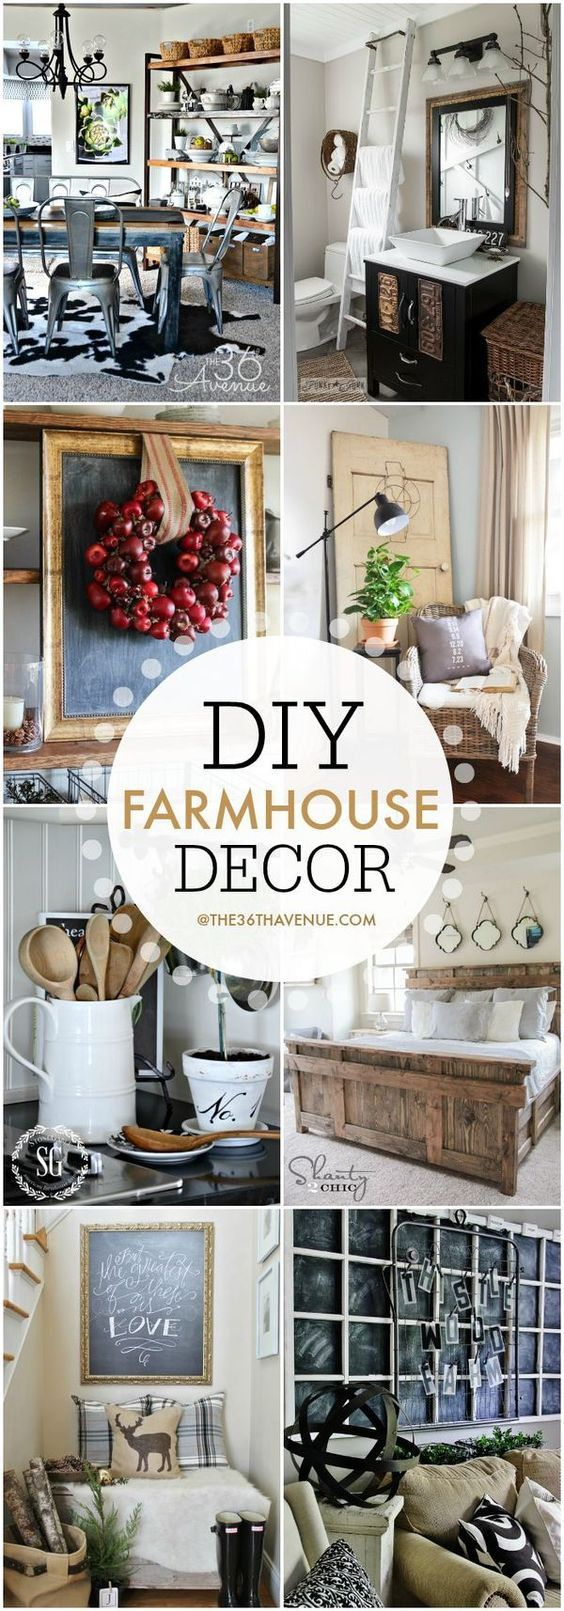 Home Decor - DIY Farmhouse Decor Ideas at the36thavenue.com Super cute ways to decorate your home!: